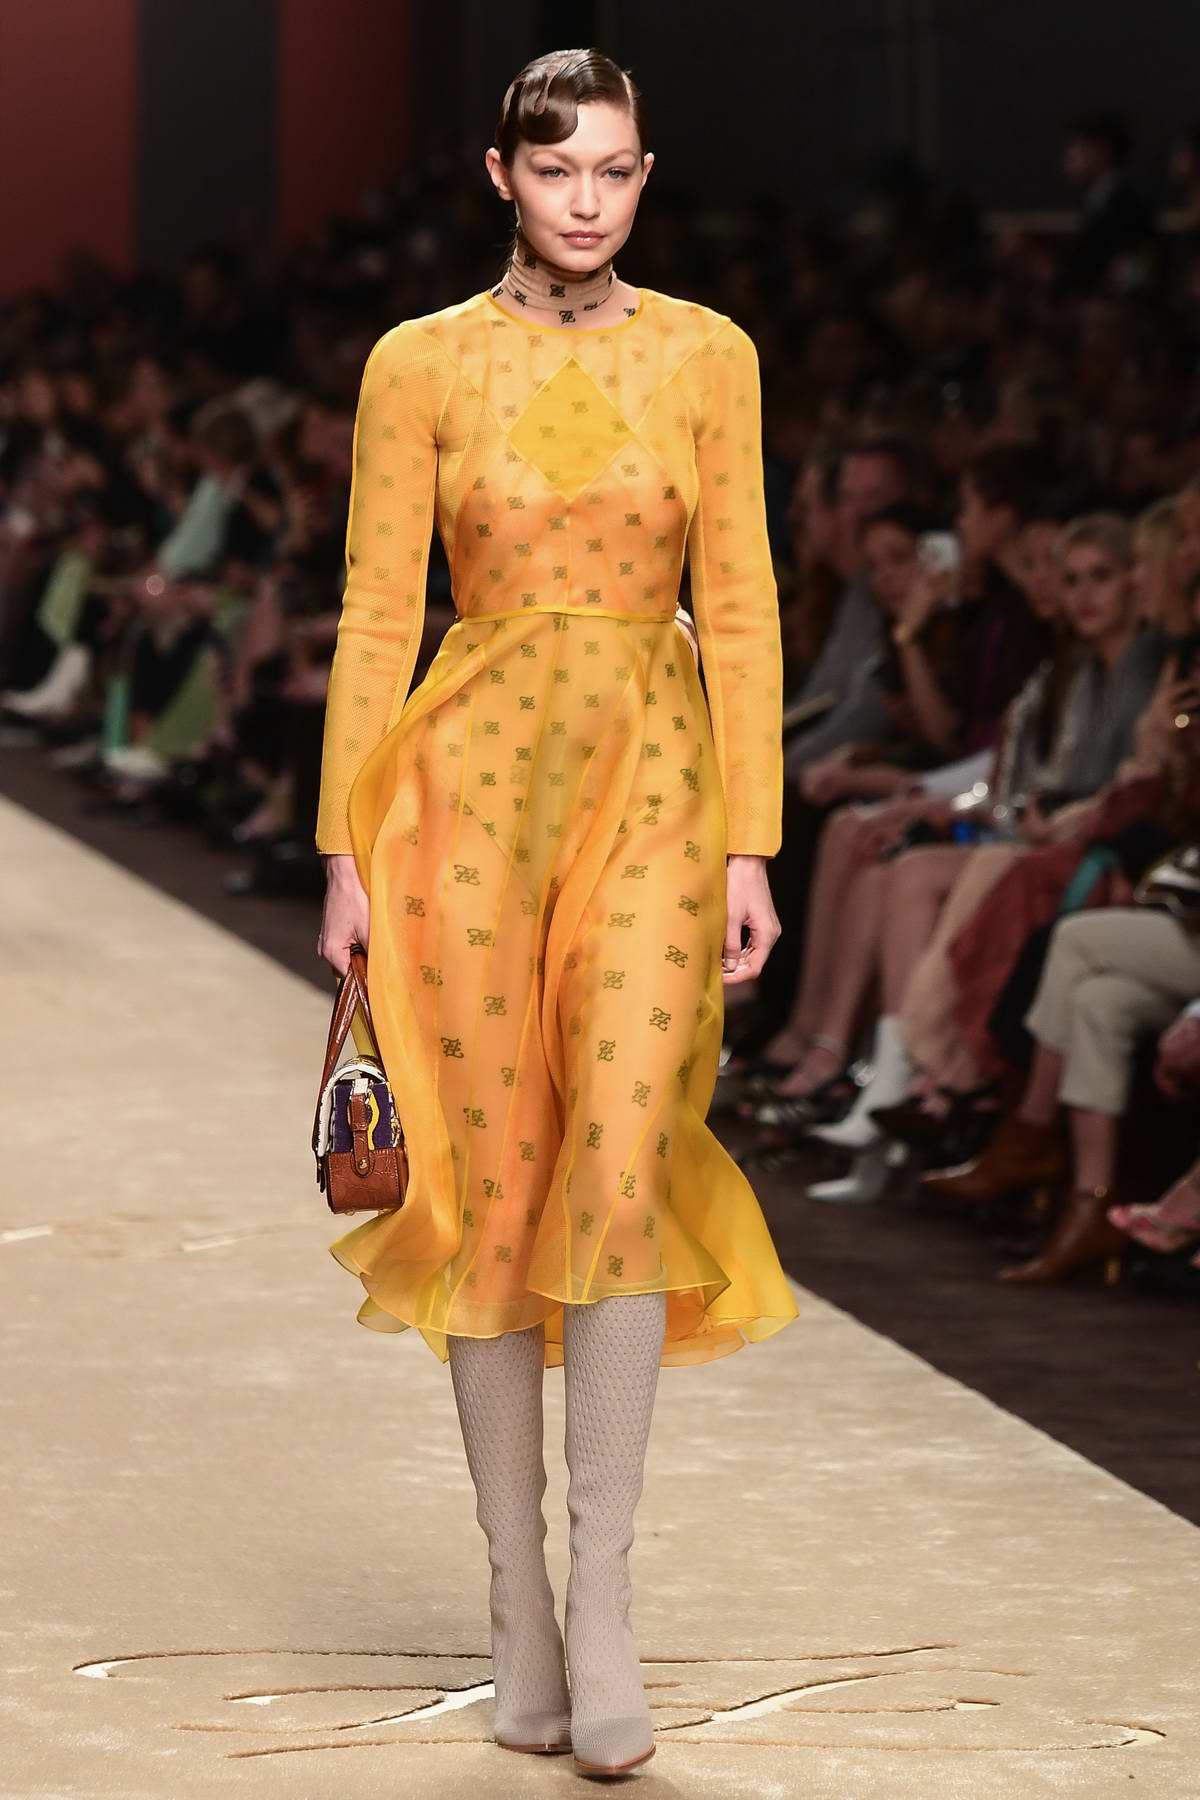 cadb94f390b Gigi Hadid walks the runway at Fendi Women s Fall Winter 2019 2020 Fashion  Show during Milan Fashion Week in Milan